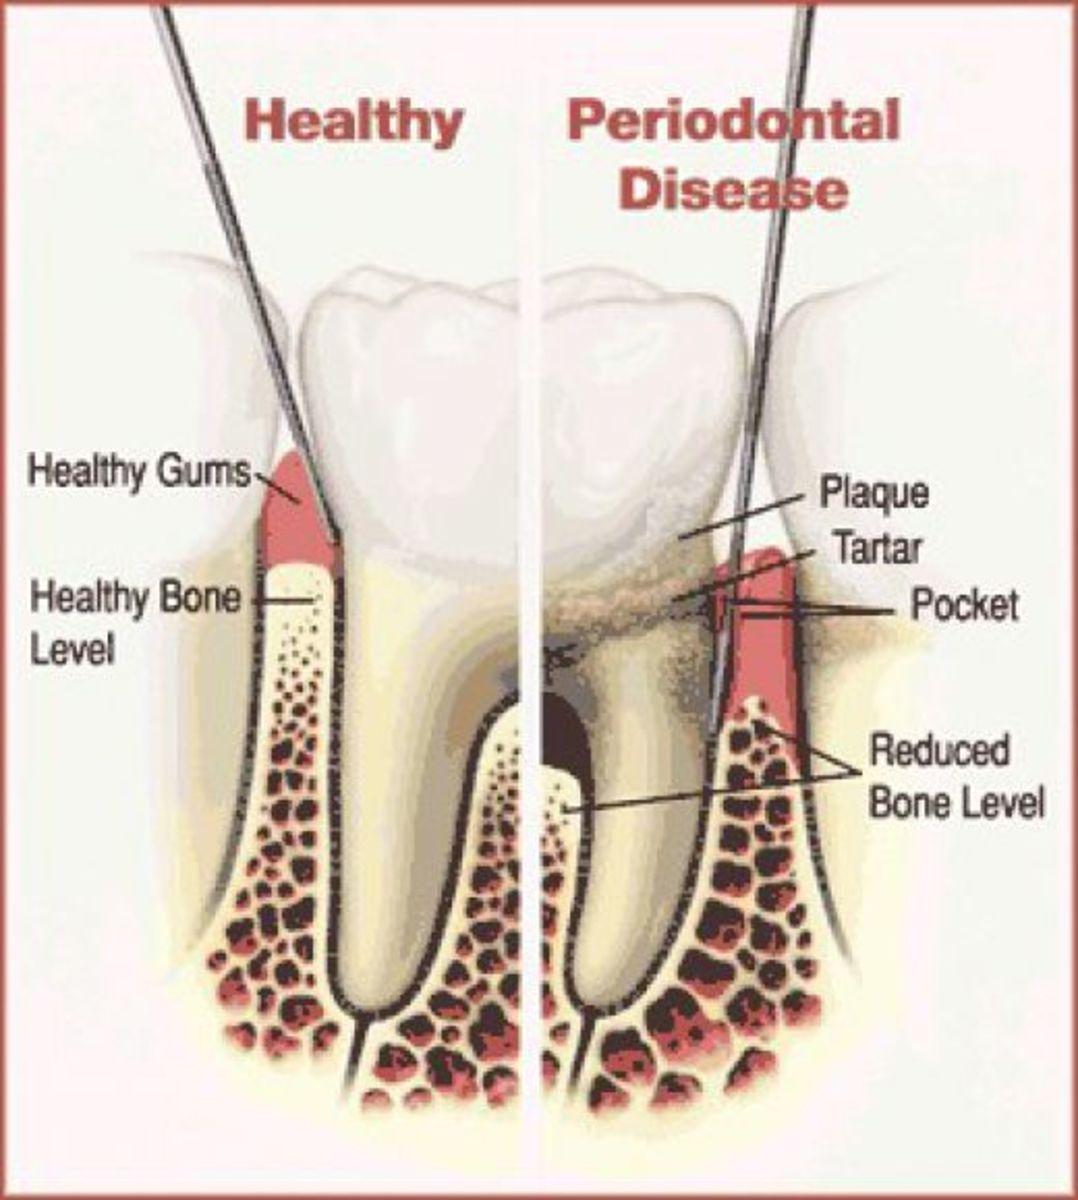 Periodontal disease destroys the jaw bone.